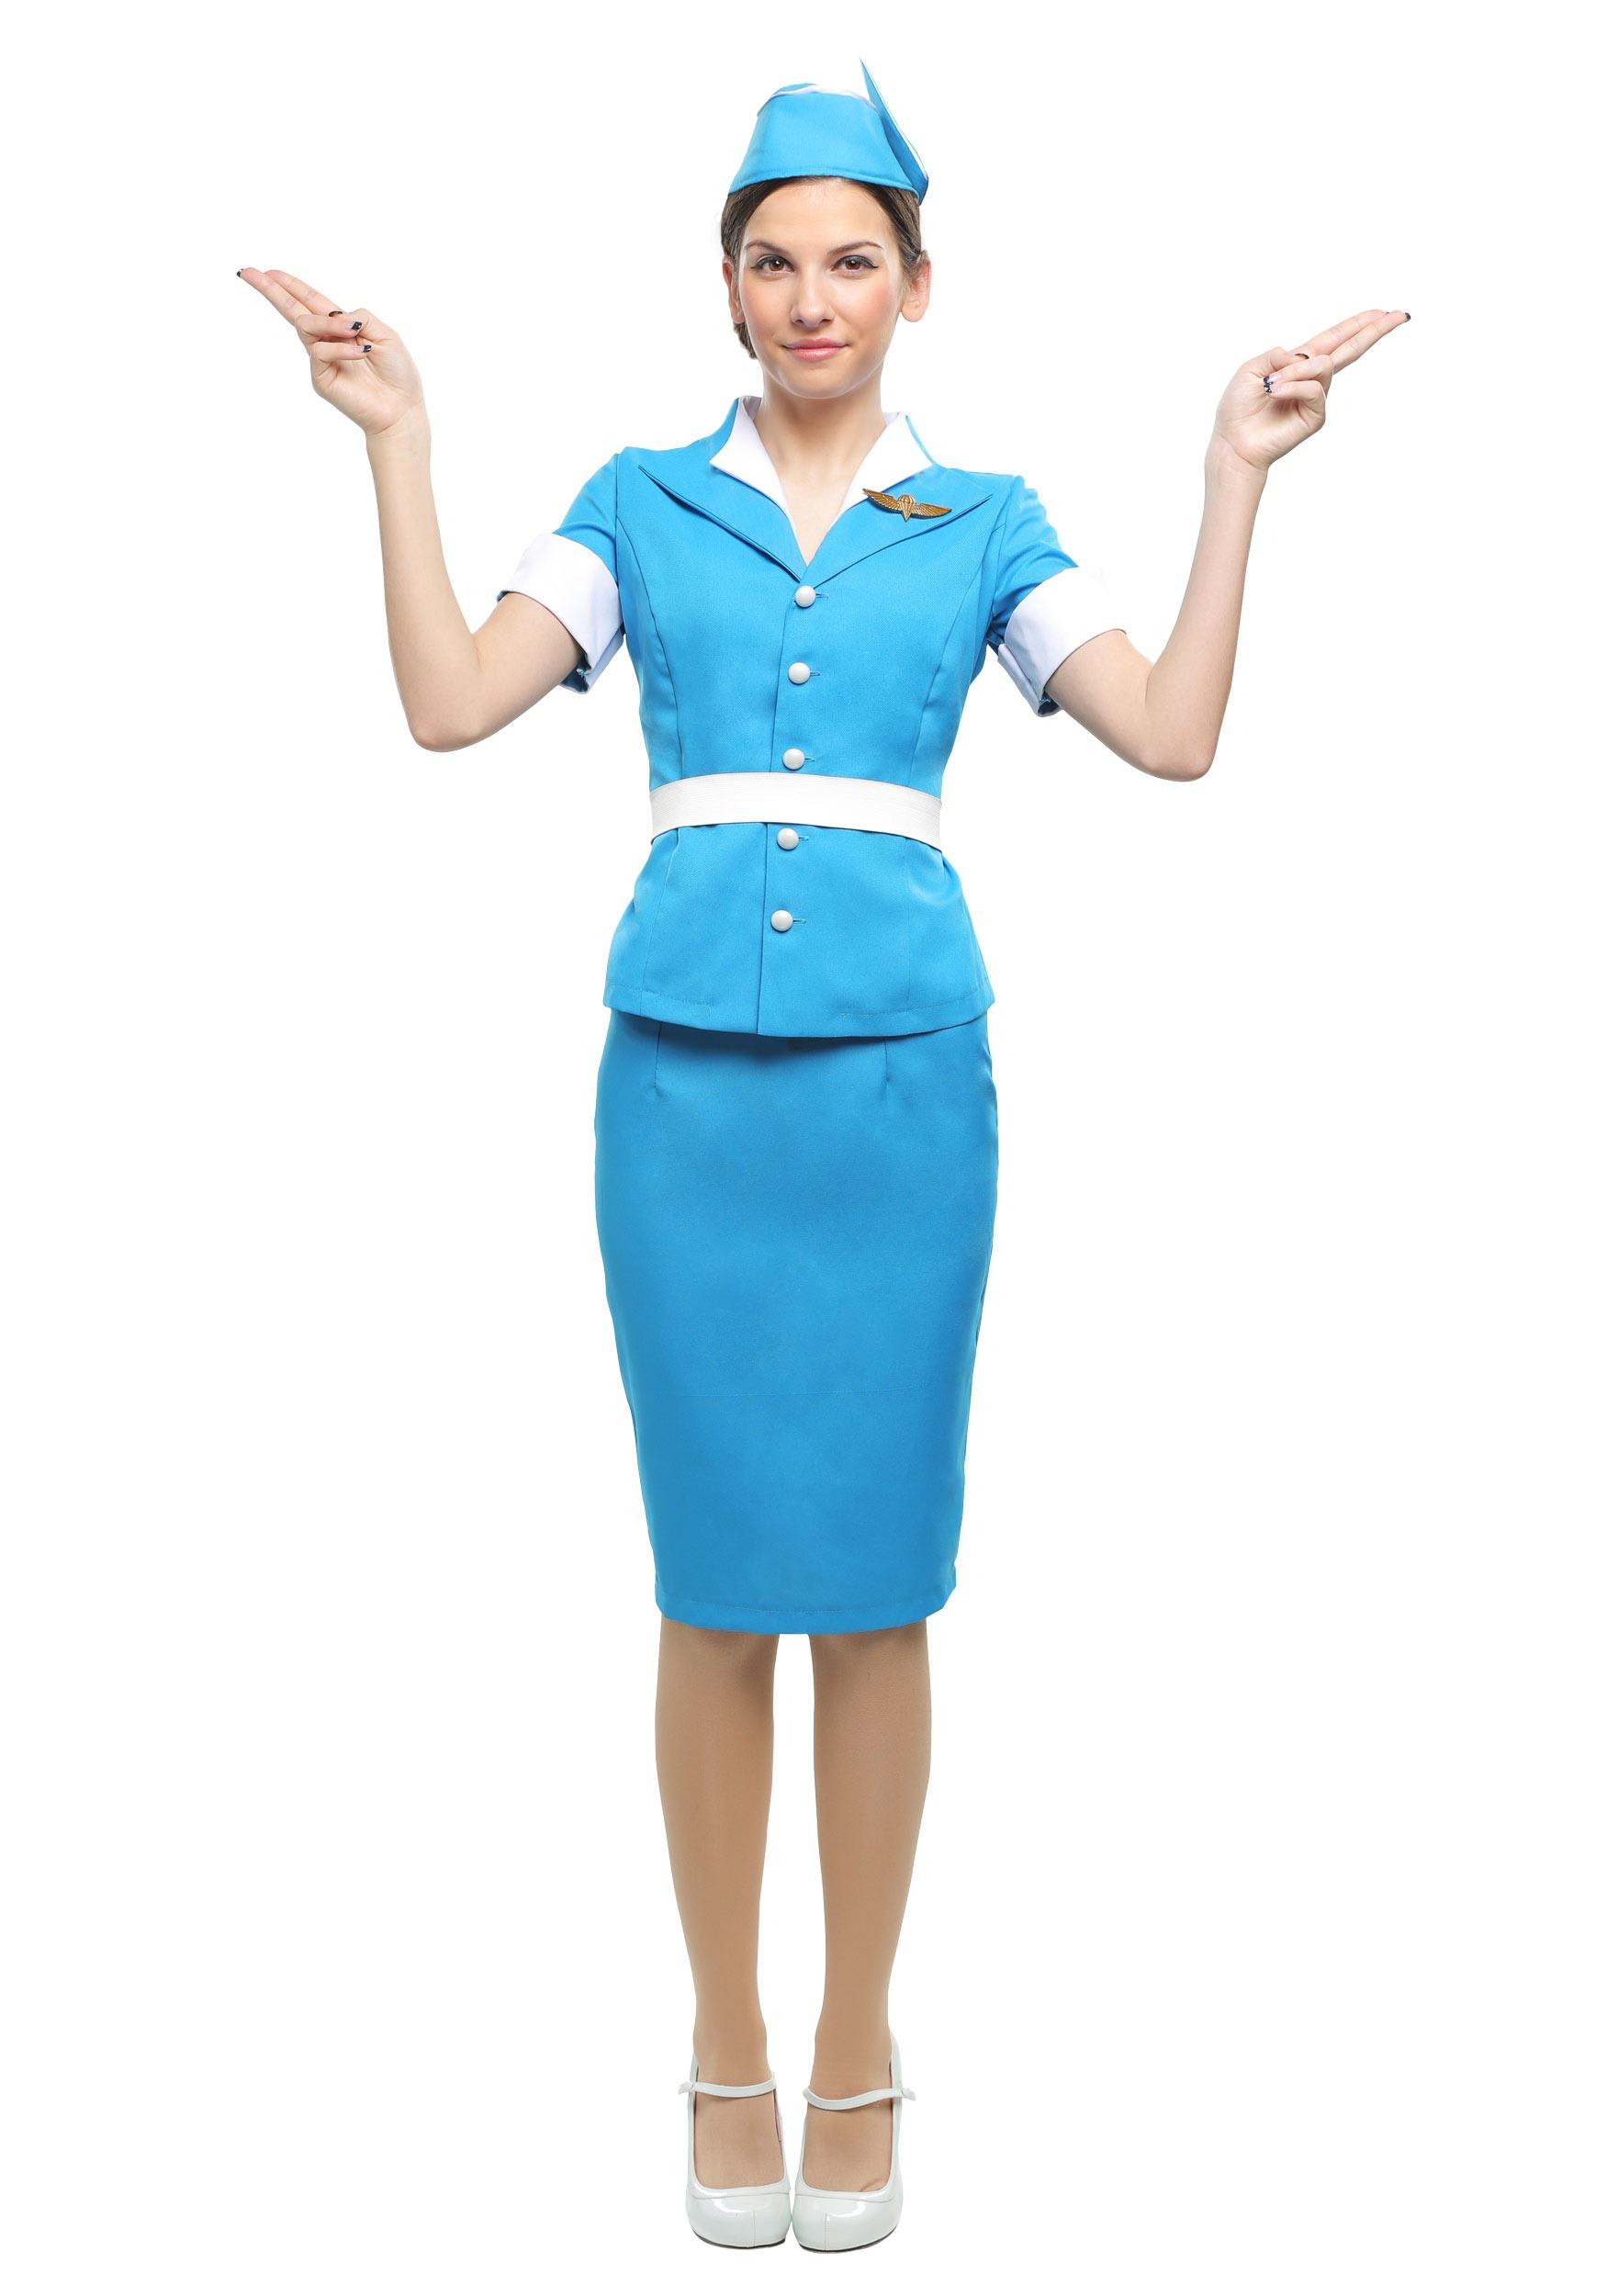 Plus Size Flight Attendant Costume for Women